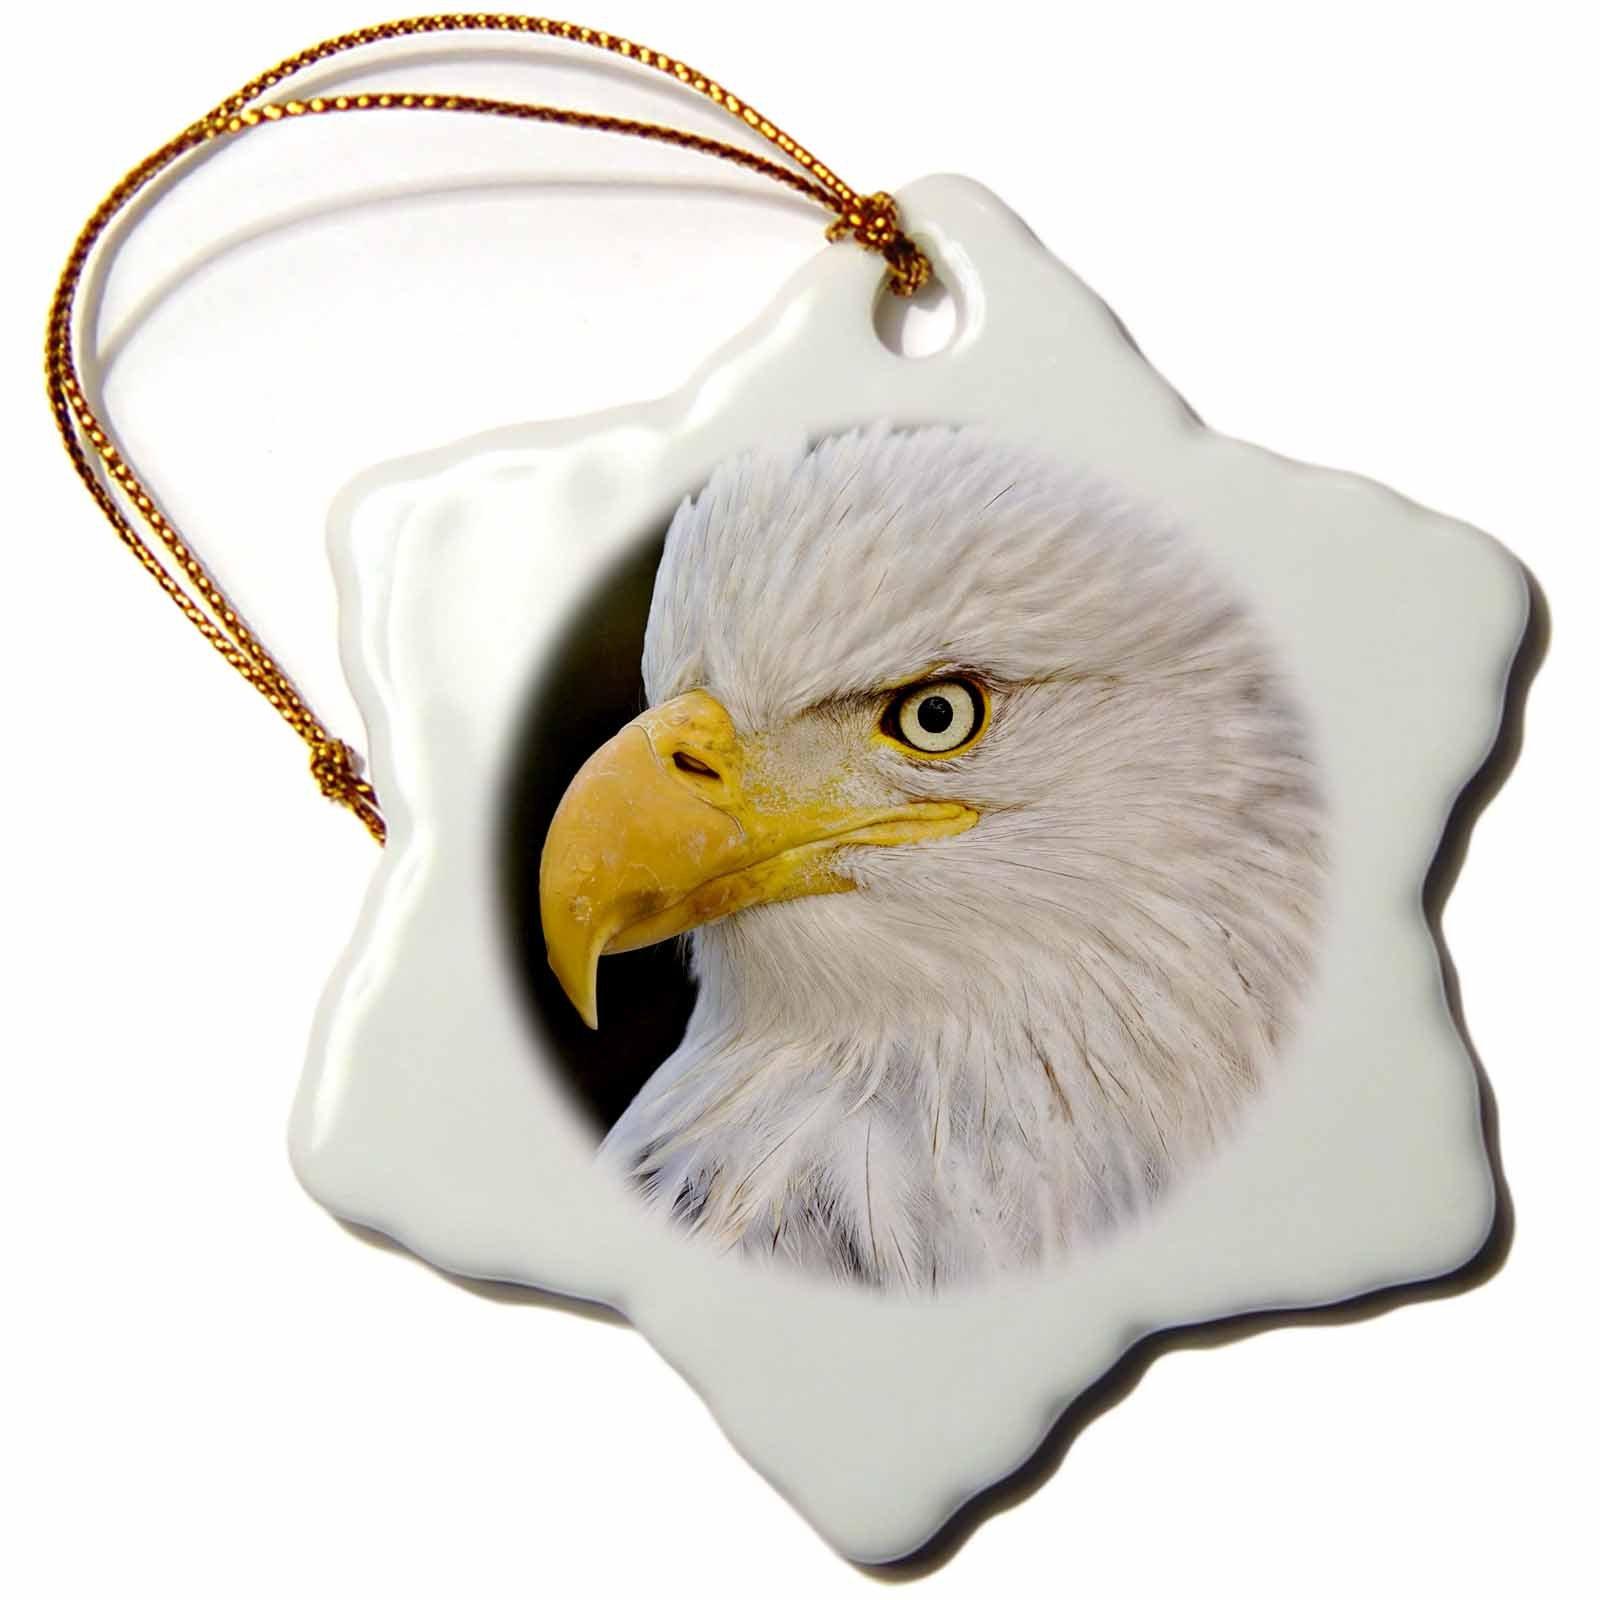 3dRose orn_87312_1 Bald Eagle, Homer, Alaska-Us02 Aje0005-Adam Jones-Snowflake Ornament, 3-Inch, Porcelain